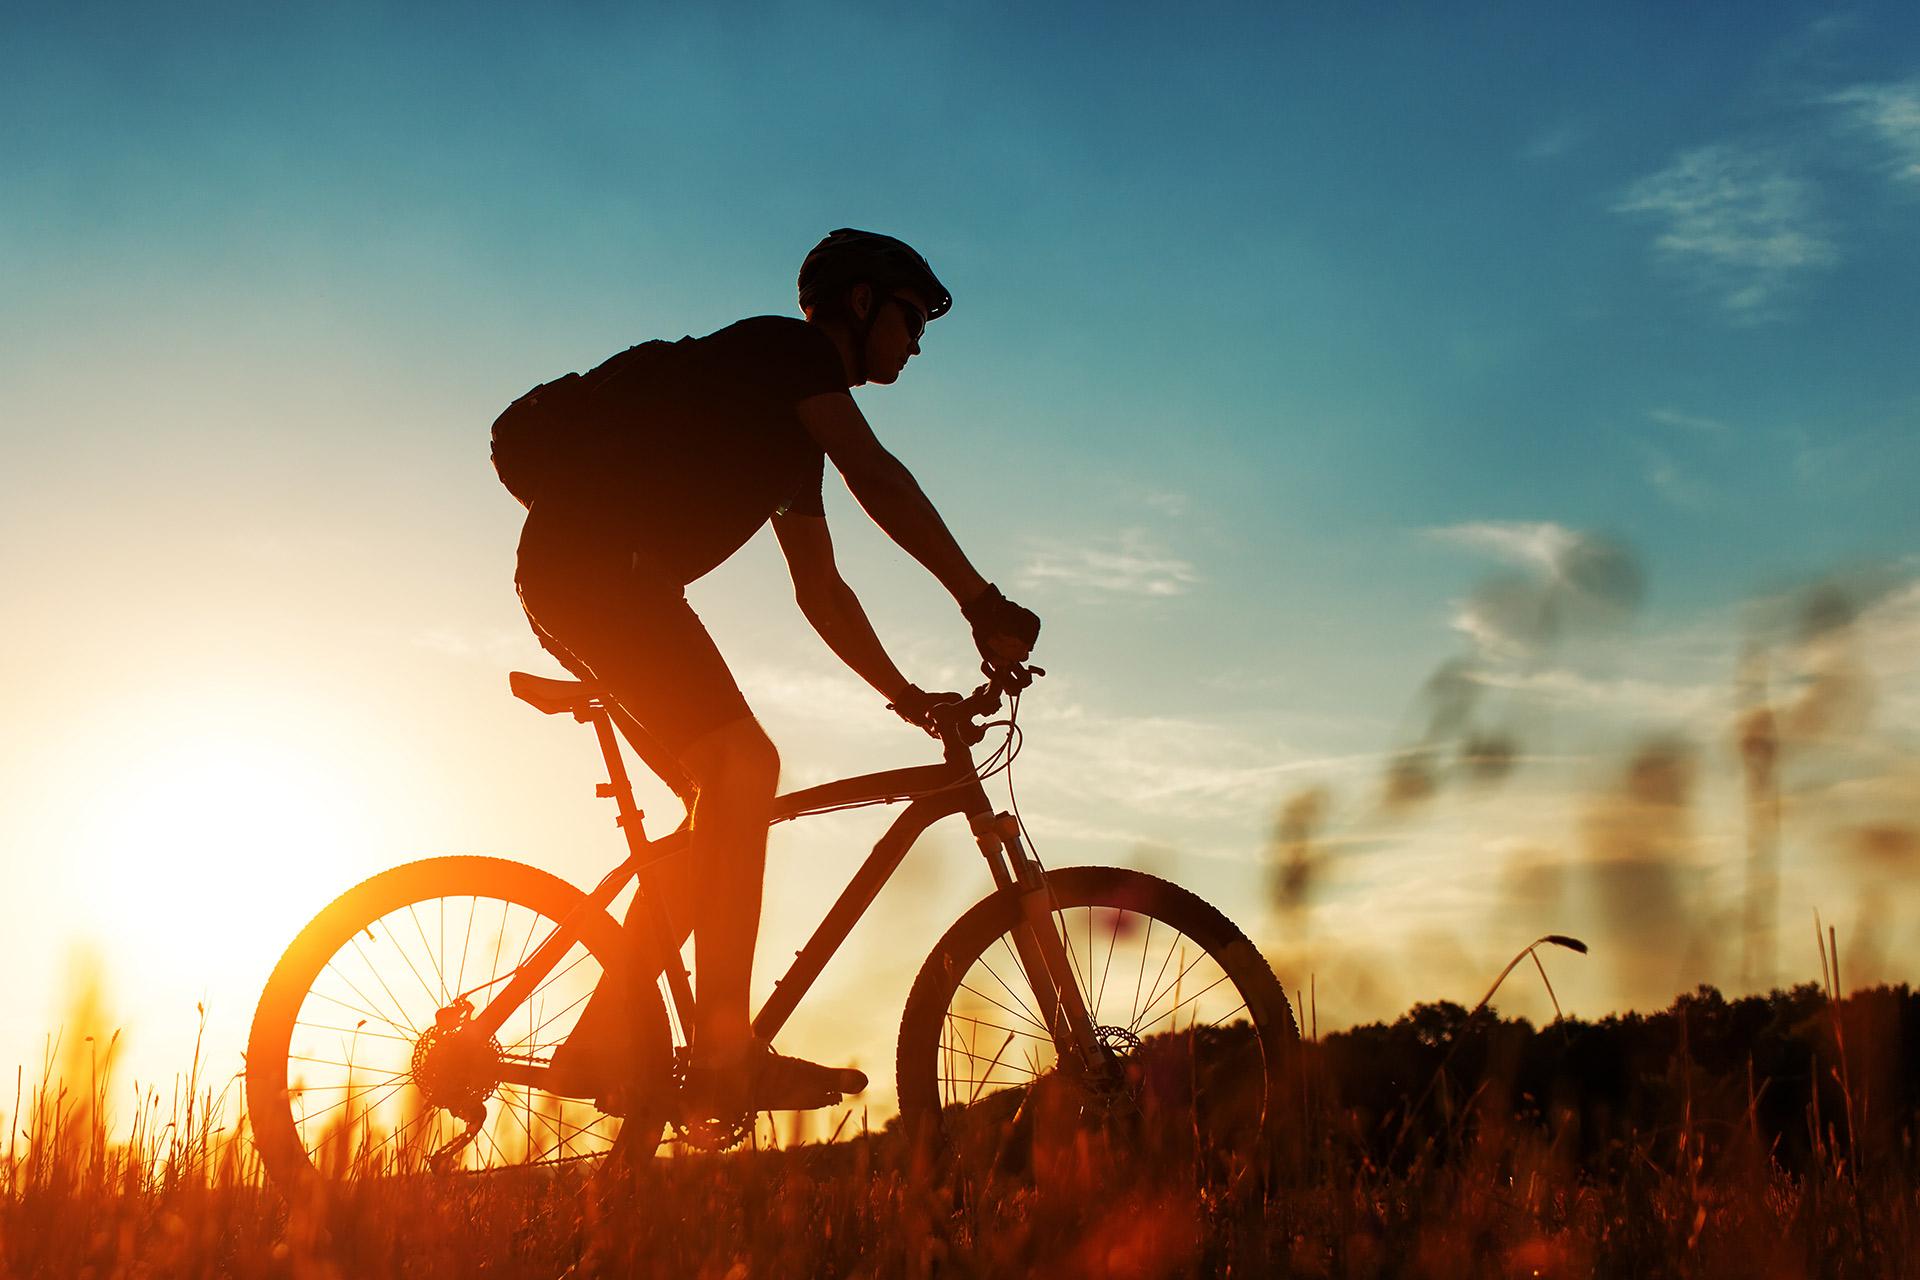 bike trail season pass adventure park. Black Bedroom Furniture Sets. Home Design Ideas